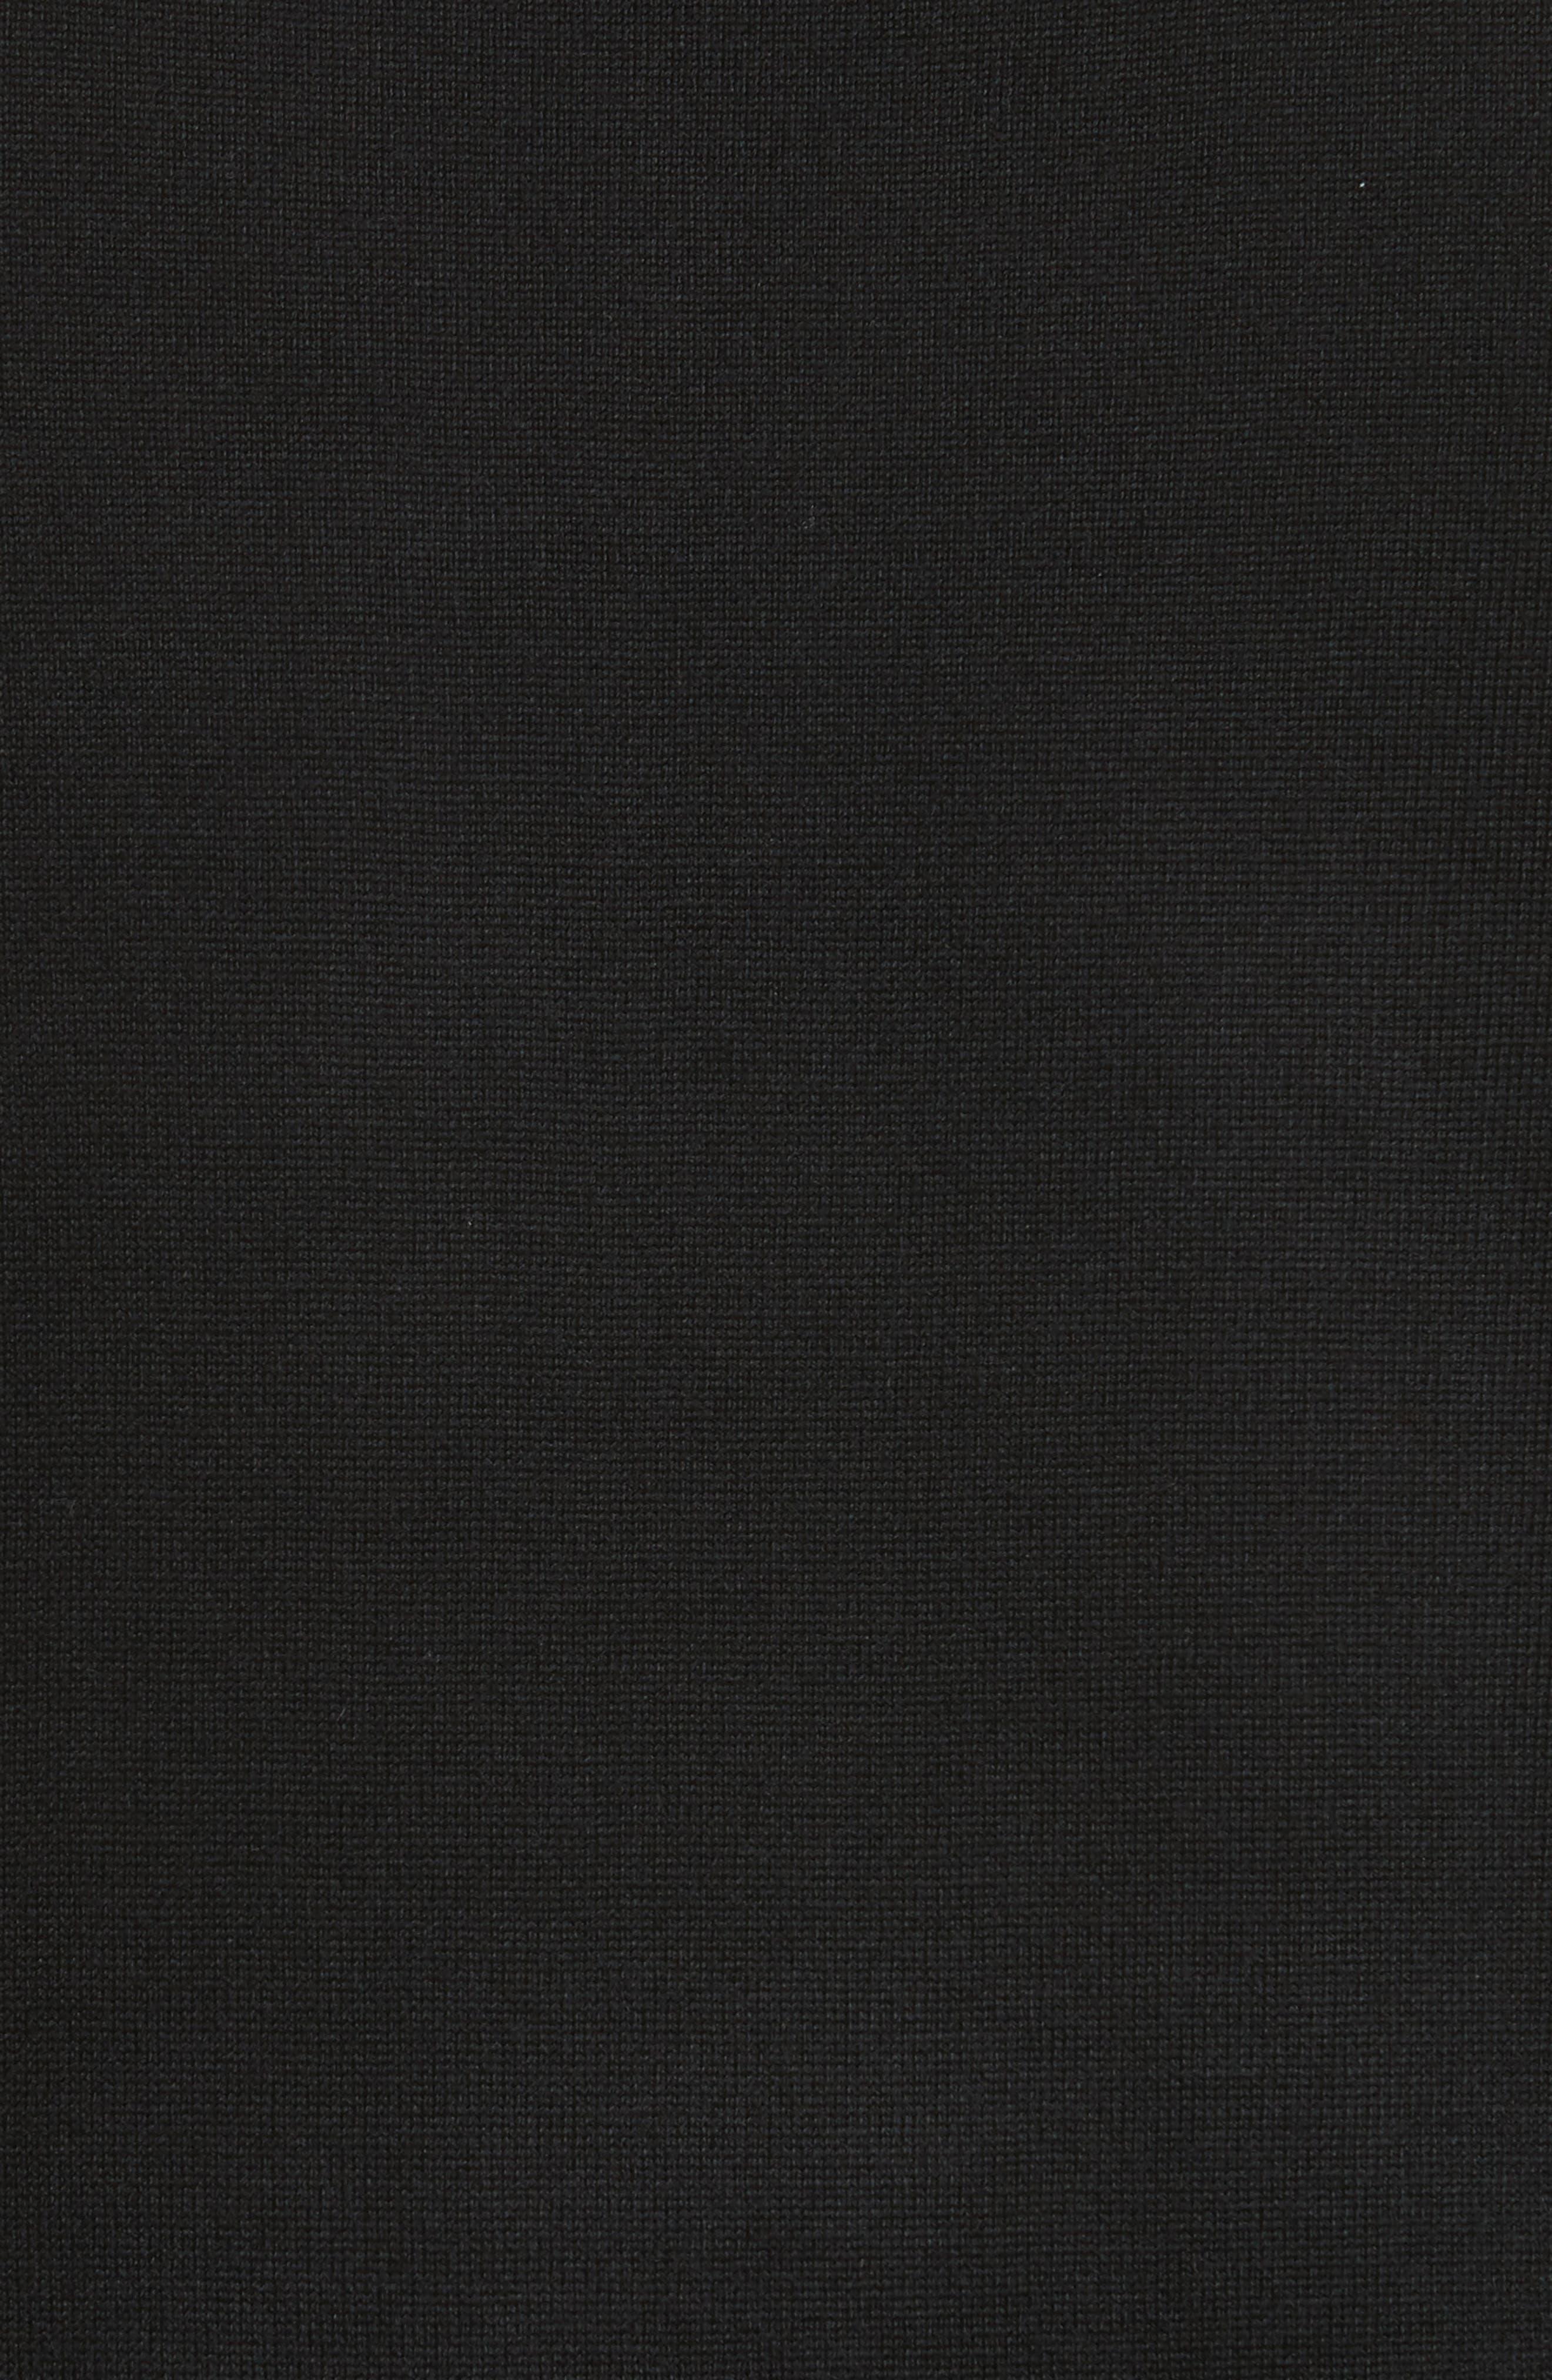 Carter Merino Wool Crewneck Sweater,                             Alternate thumbnail 5, color,                             BLACK